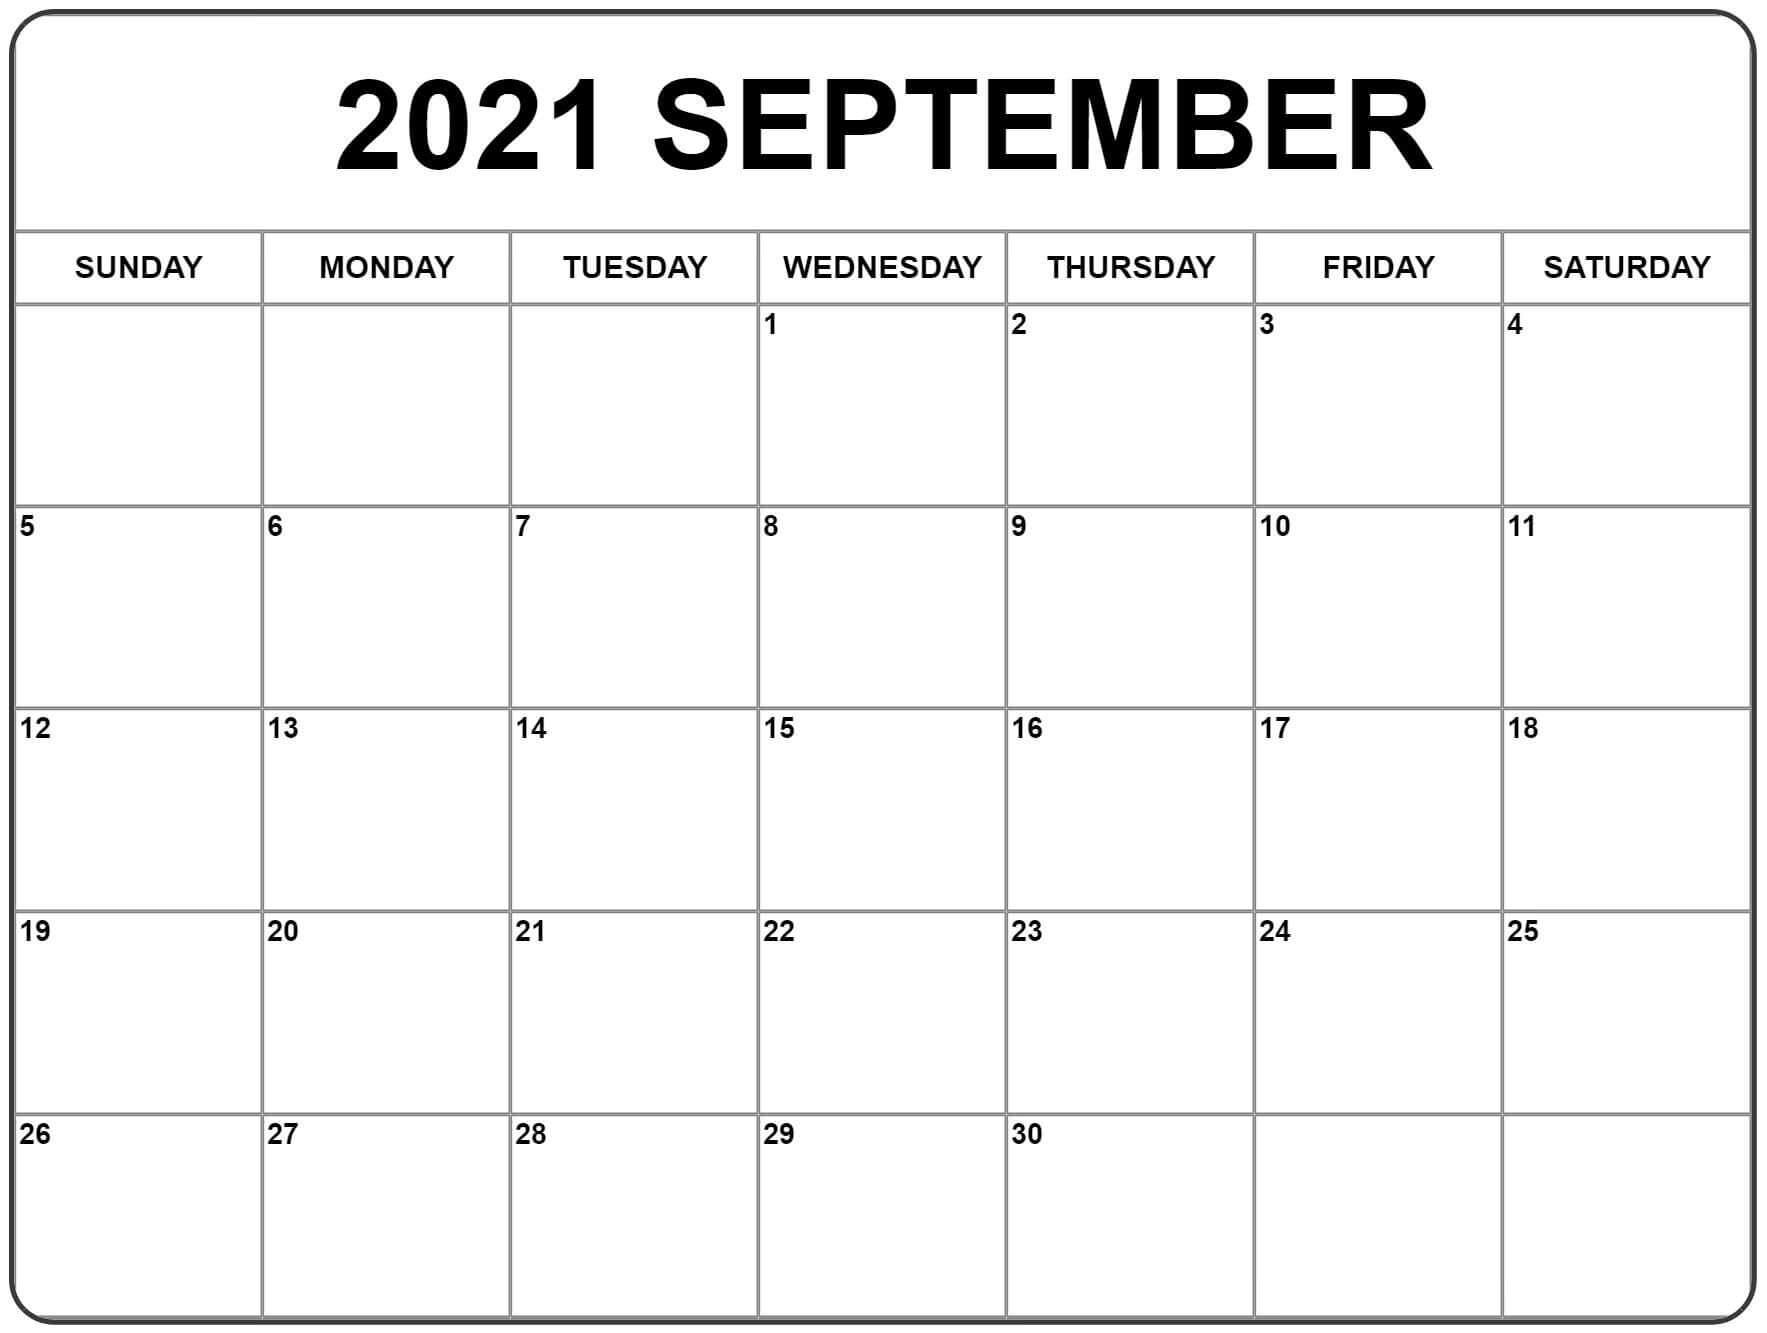 september 2021 calendar template to print - Printable Calendar Pdf